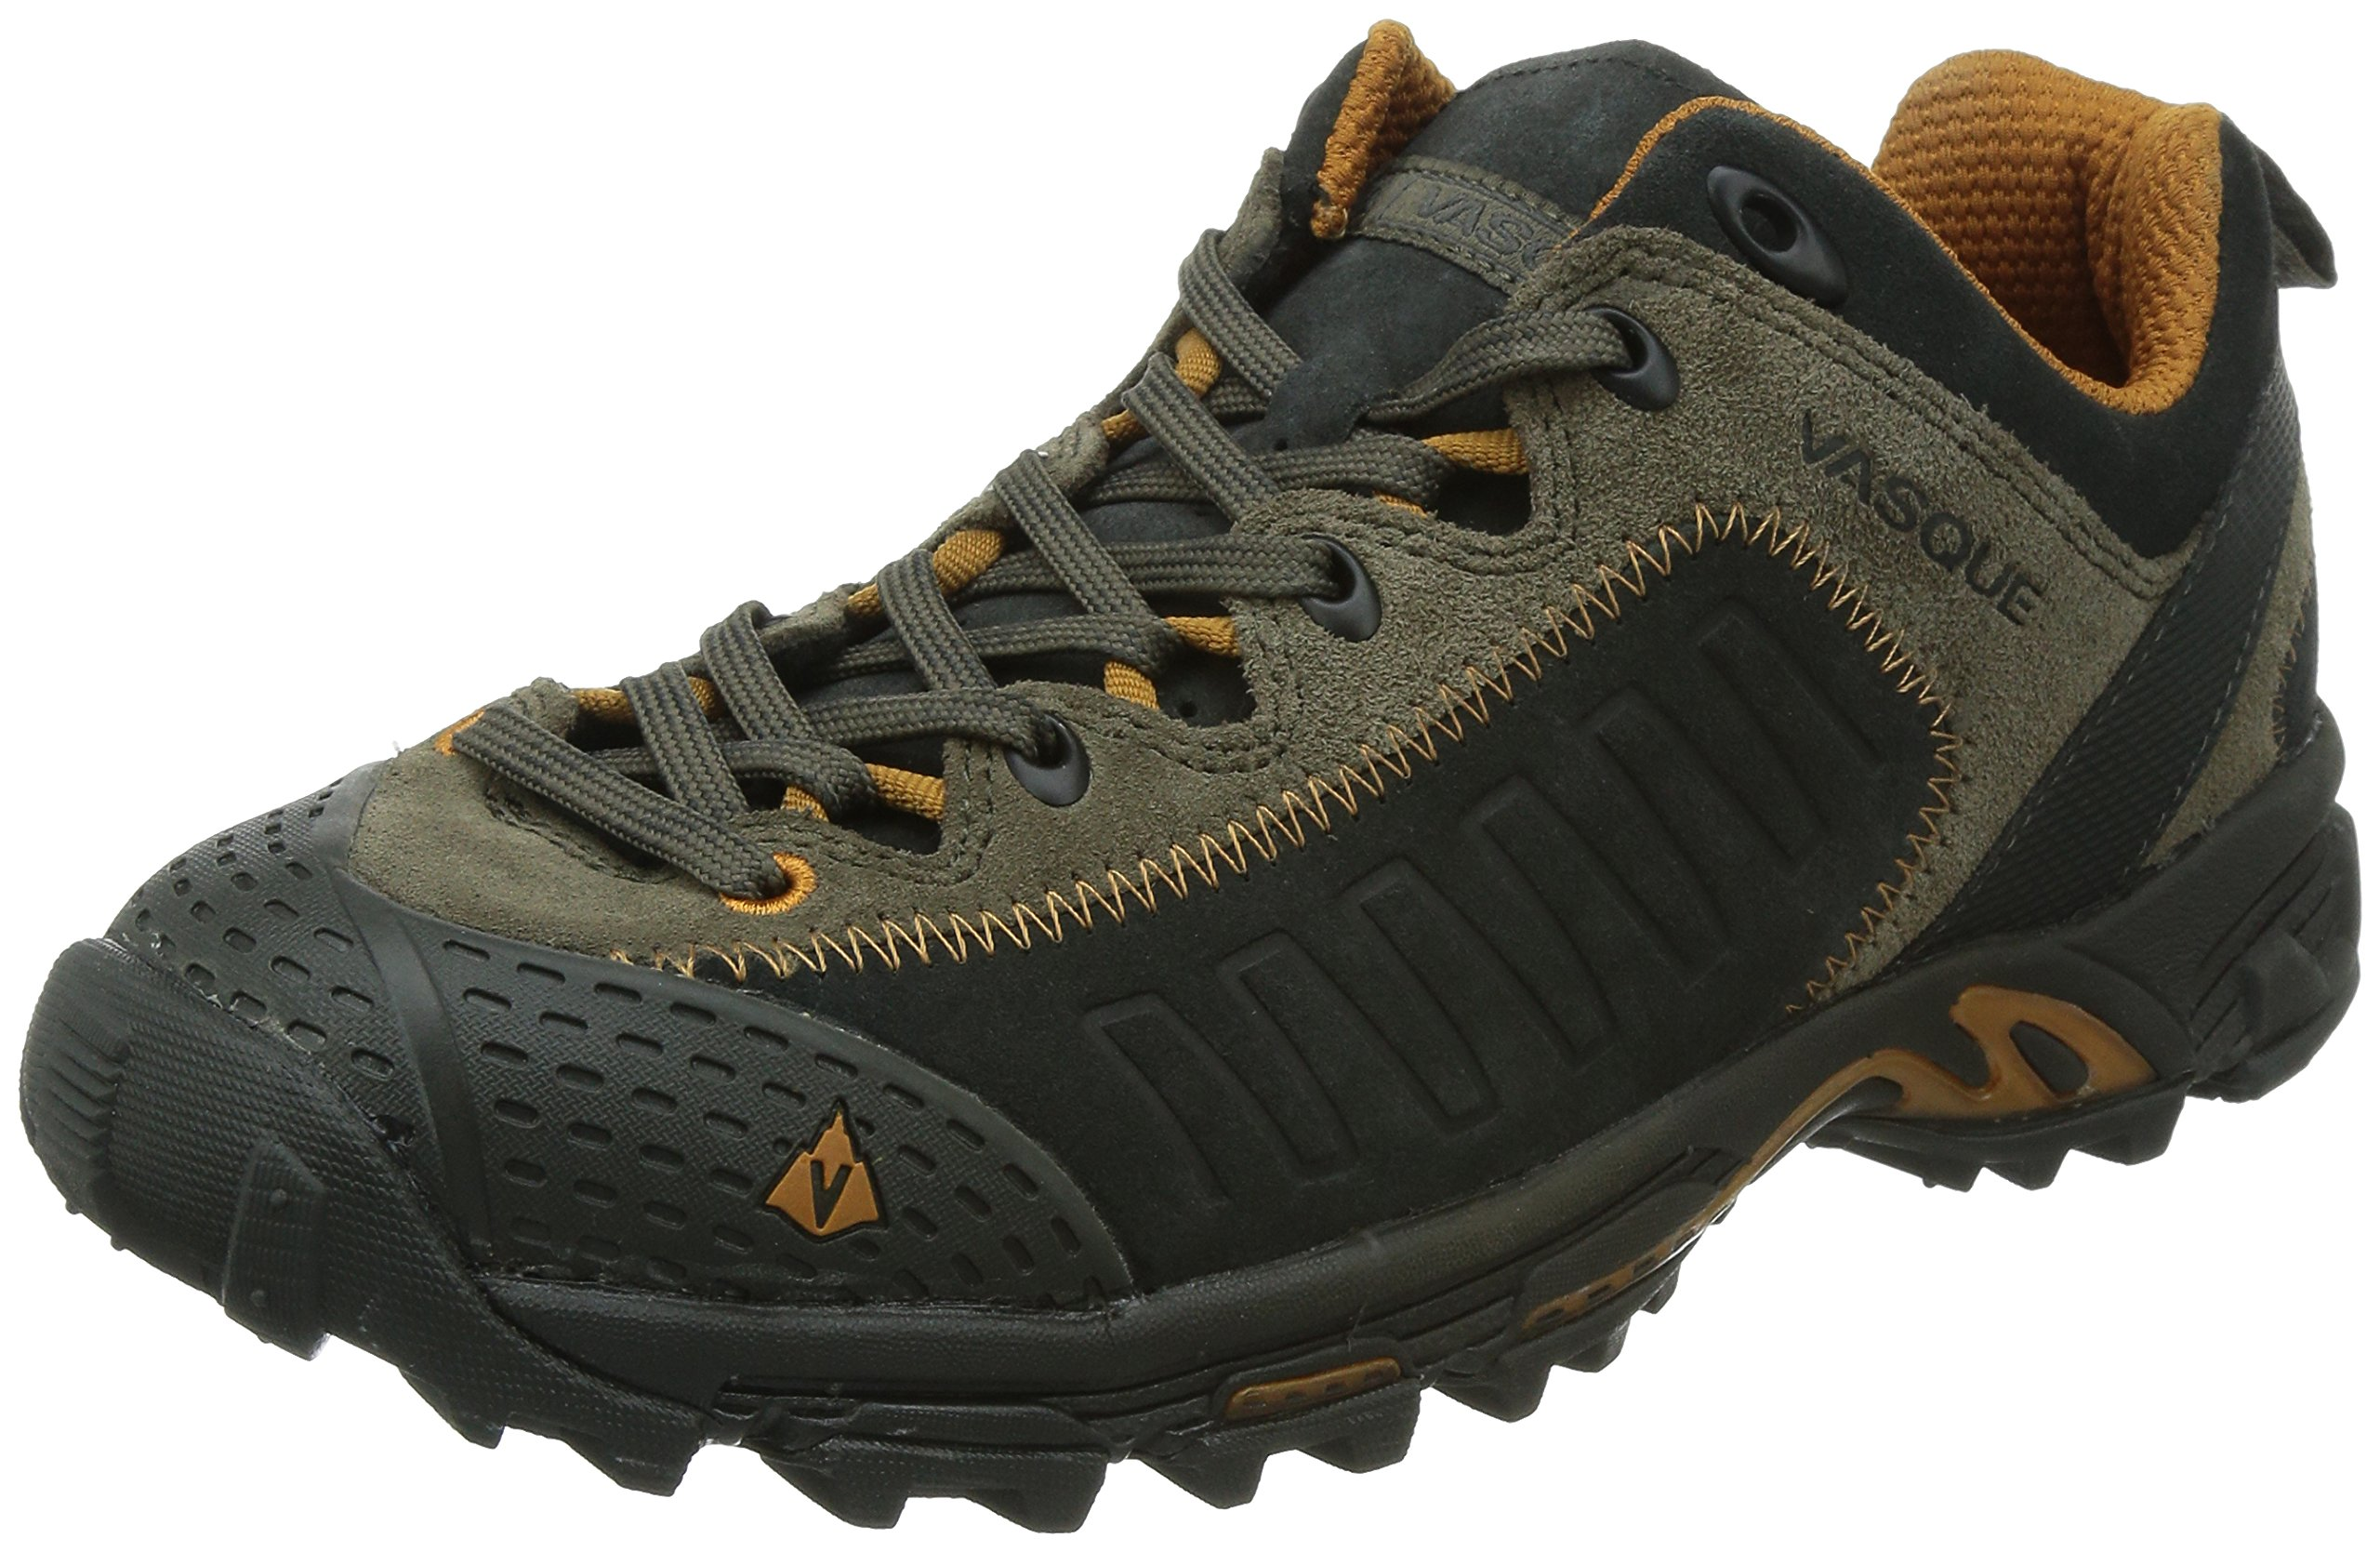 Vasque Men's Juxt Multisport Shoe,Peat/Sudan Brown,11 M